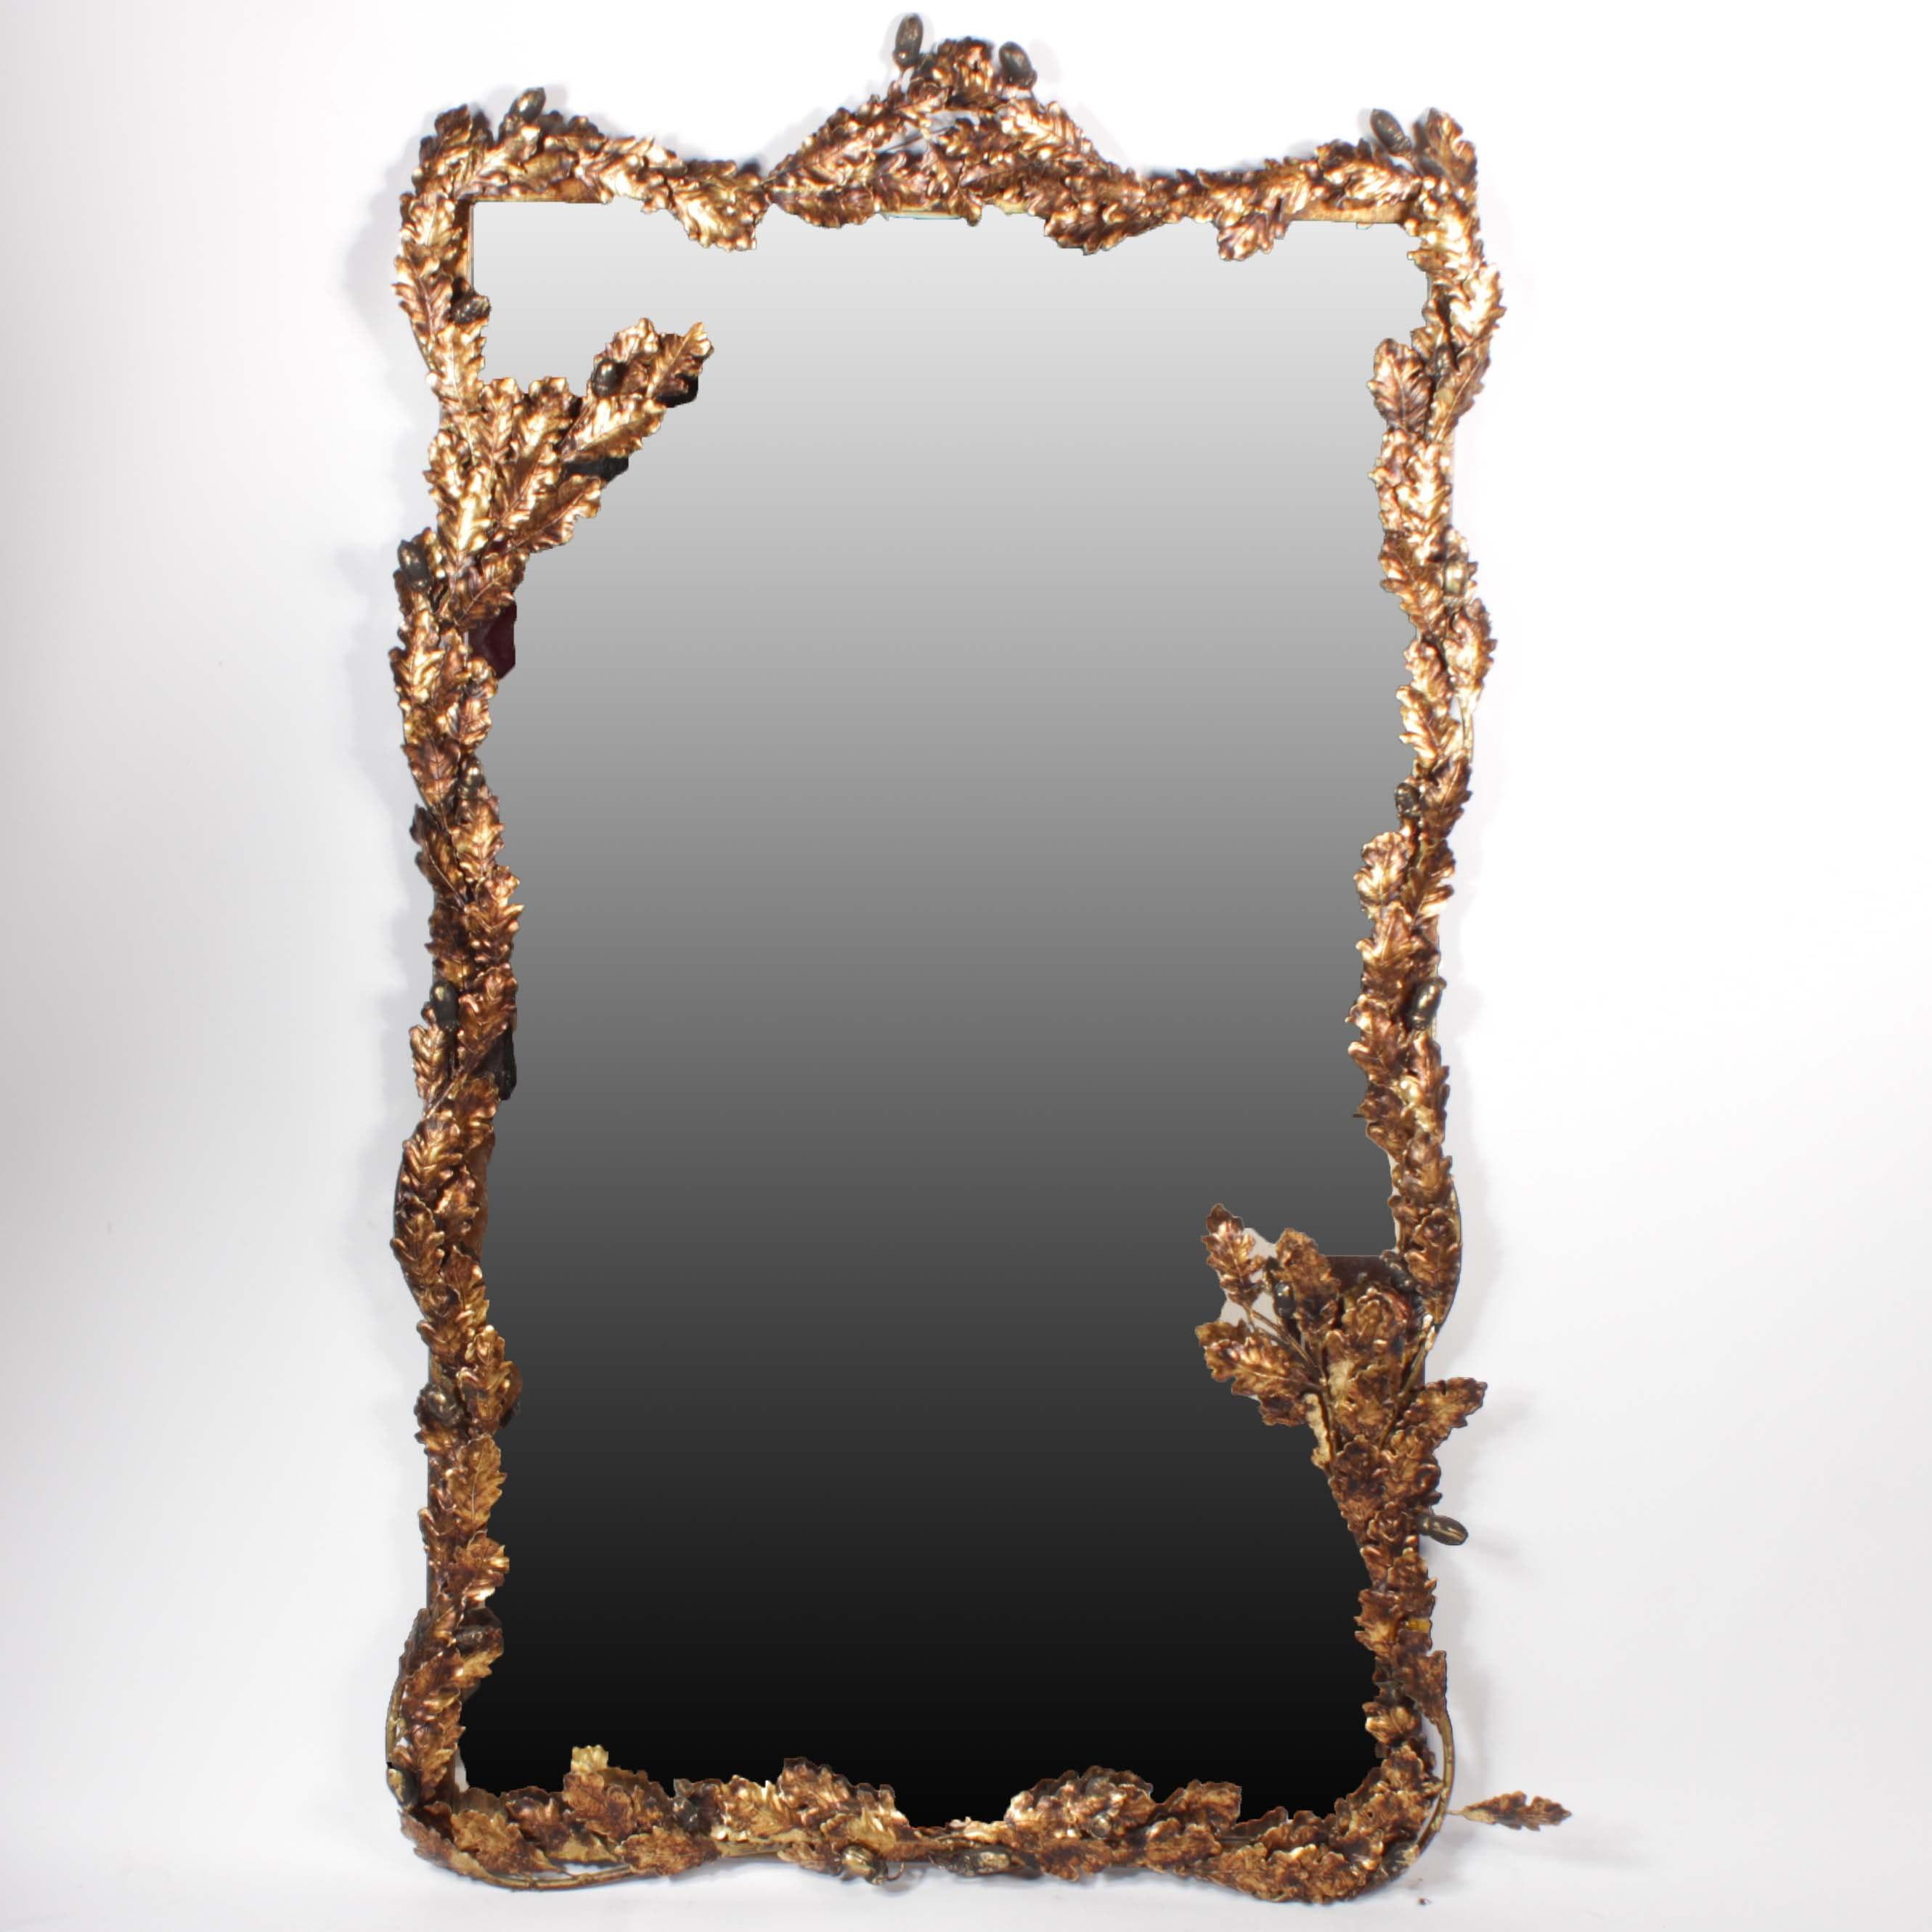 Cast Metal Oak Leaf and Acorn Wall Mirror